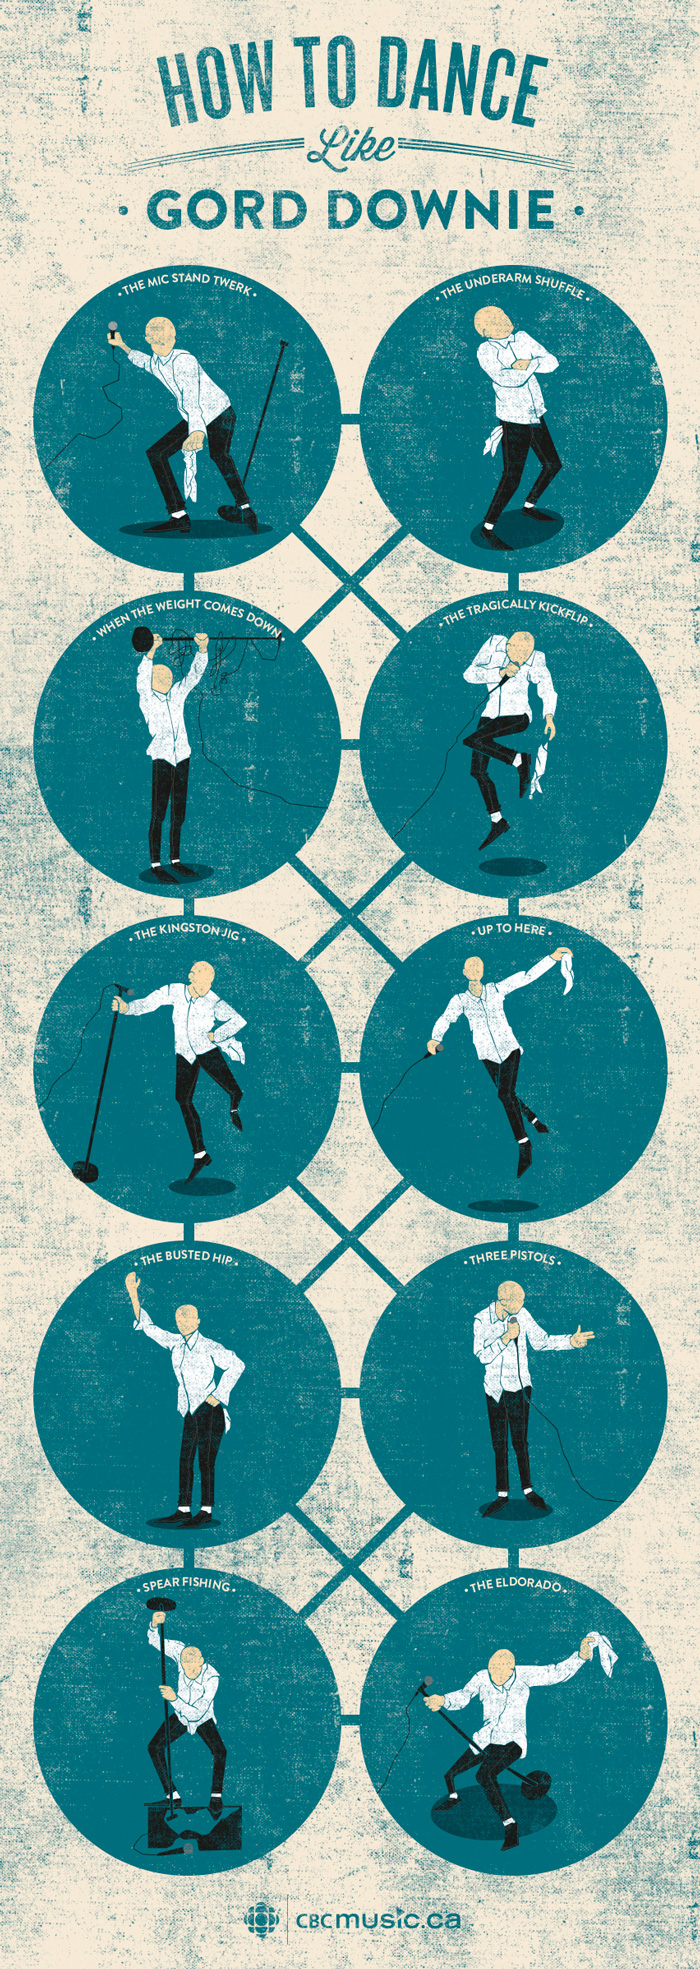 Markus-Wreland-How-to-dance-like-Gord-Downie-Infographic.jpg